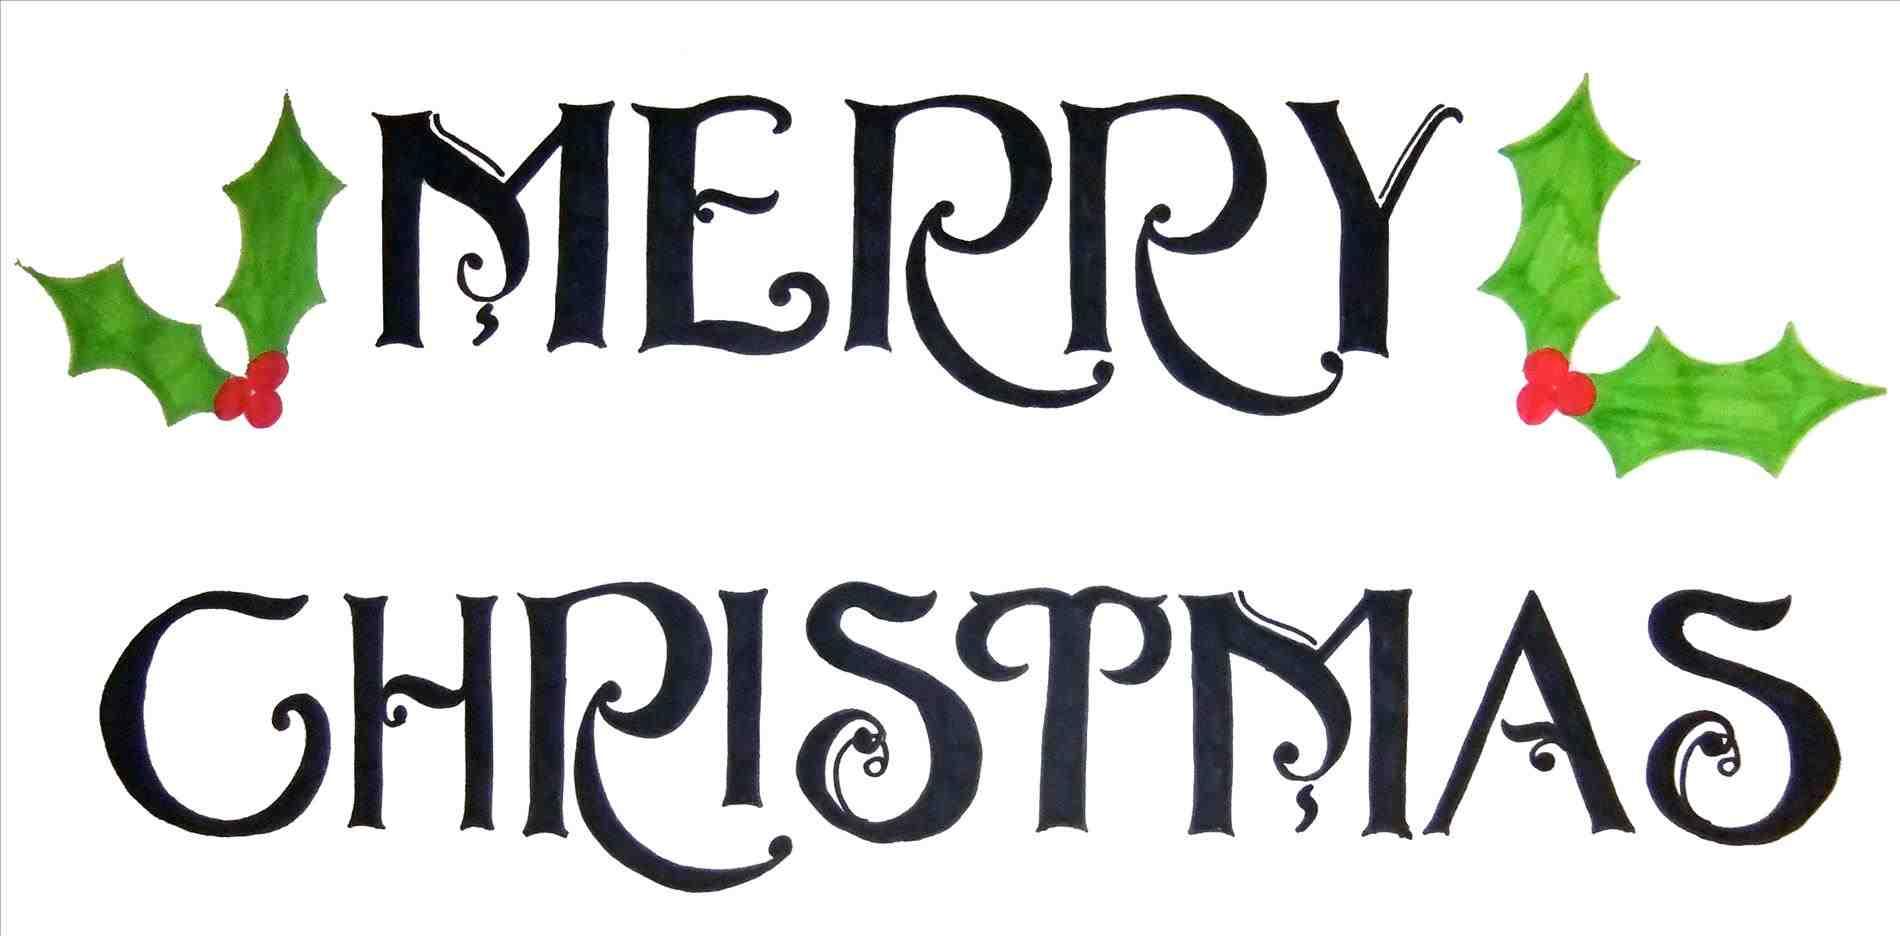 1900x936 Merry Christmas Nativity Clip Art Cheminee.website